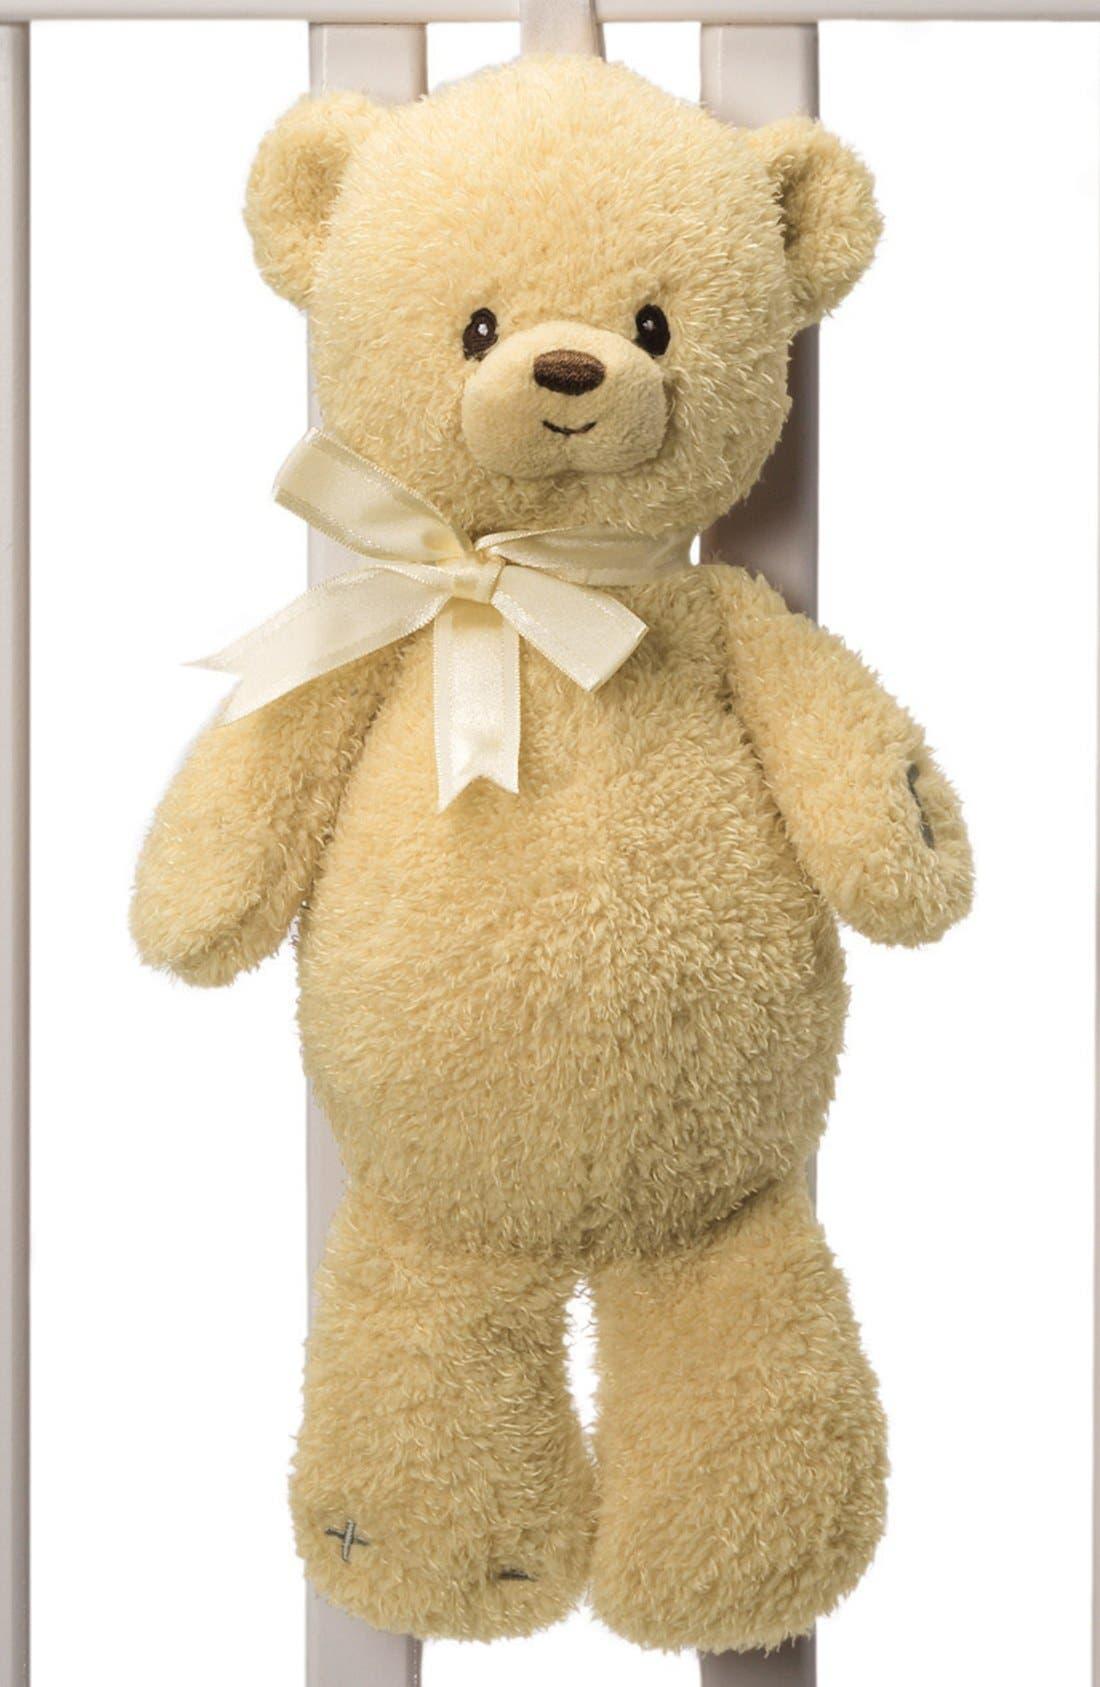 Alternate Image 1 Selected - Baby Gund 'Teddi' Soothing Sounds Bear